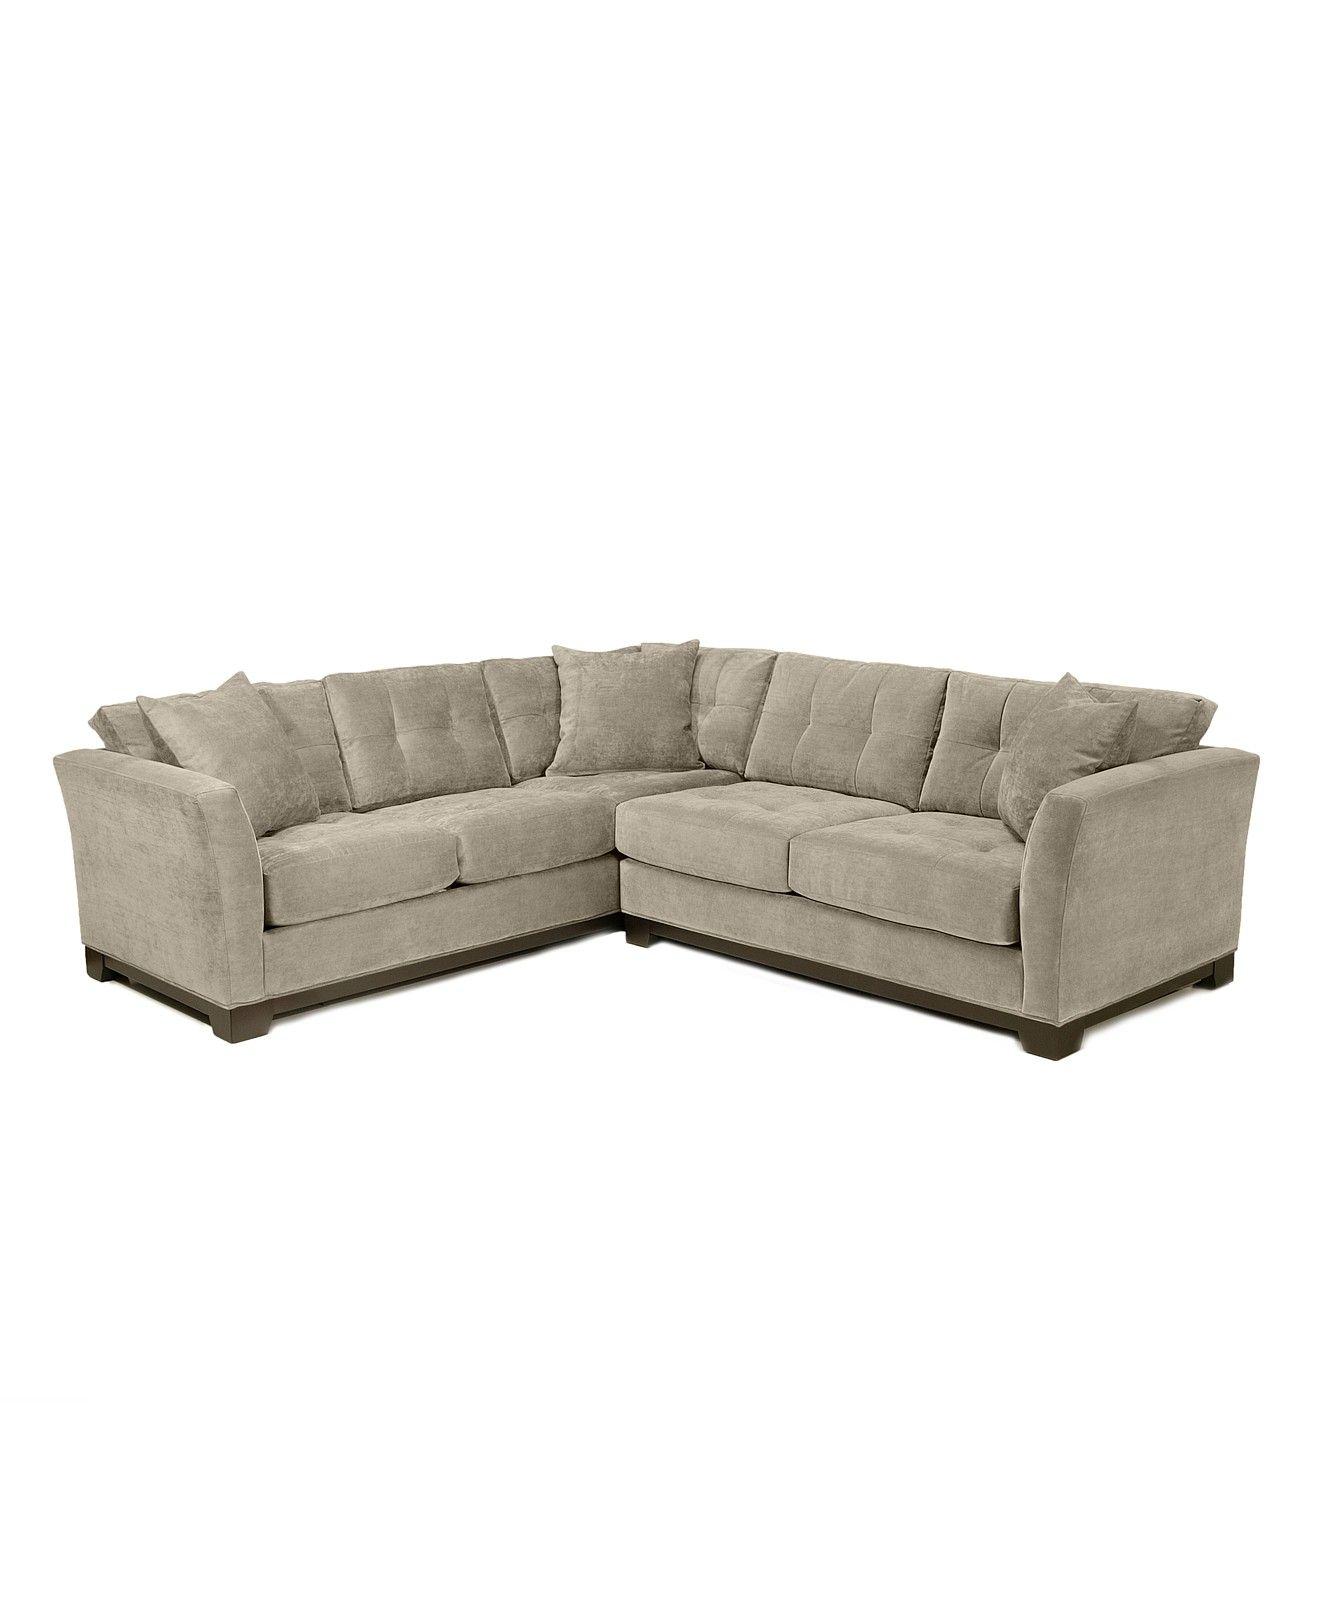 Elliot Fabric Microfiber 2 Piece Sectional Sofa Custom Colors